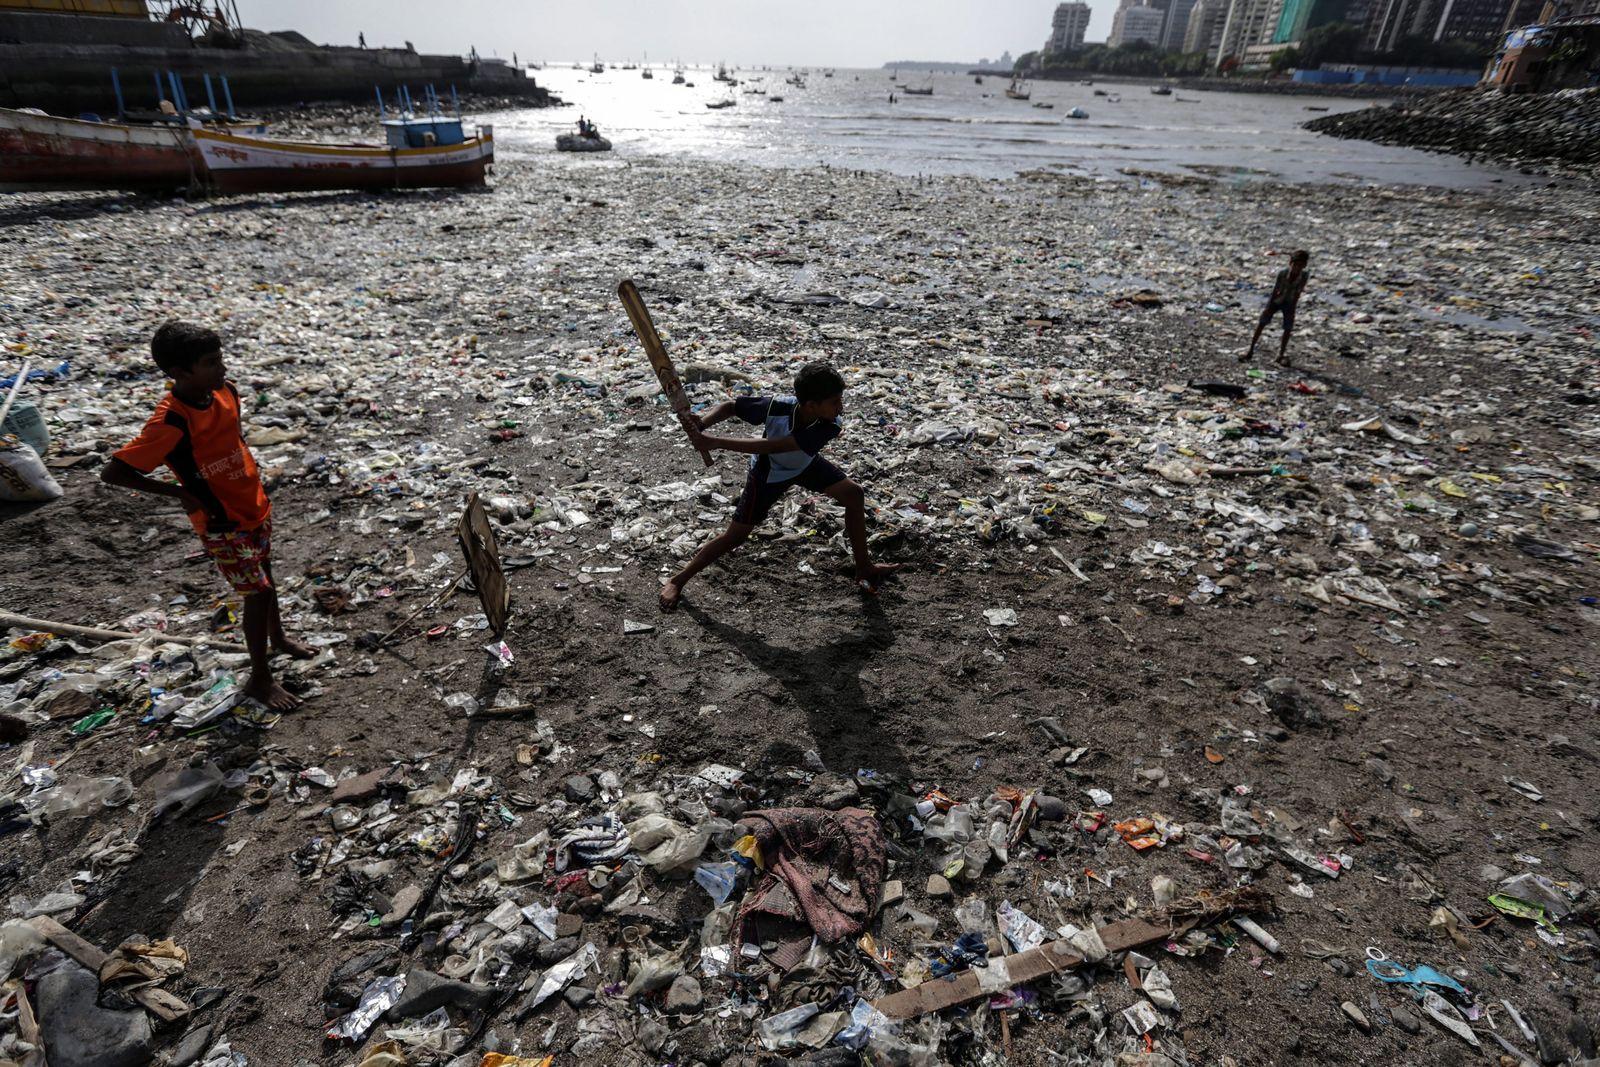 Meeresverschmutzung durch Reifen